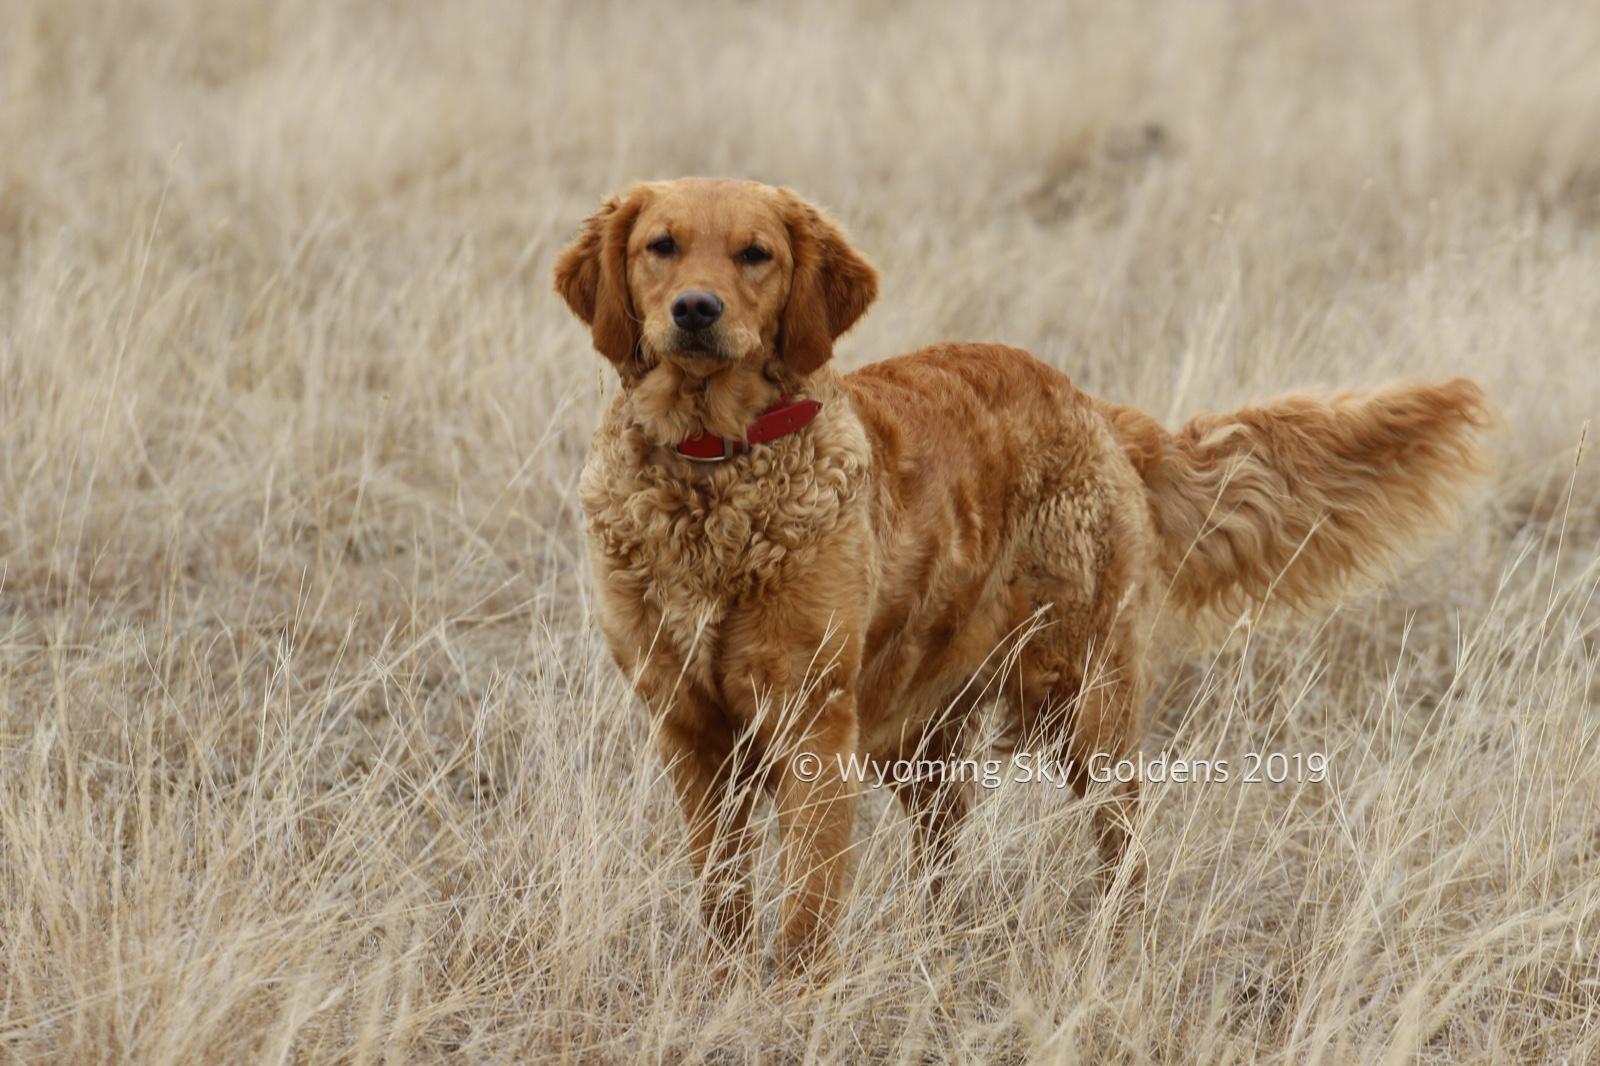 Lexi, Wyoming Sky Goldens